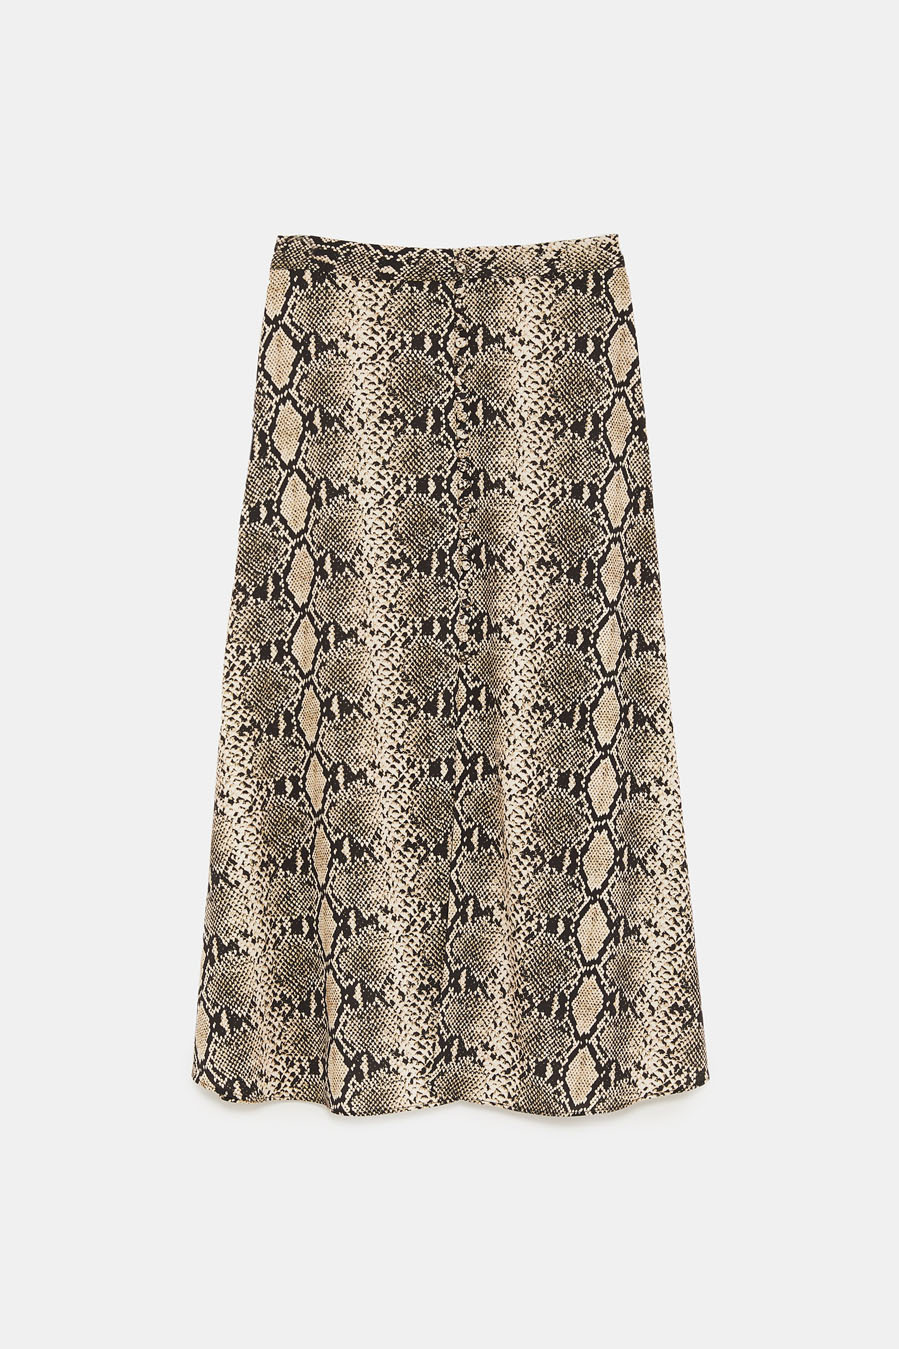 378483c91 SHOPPING: 1 falda 'animal print' y 7 'looks' por menos de 80 euros ...